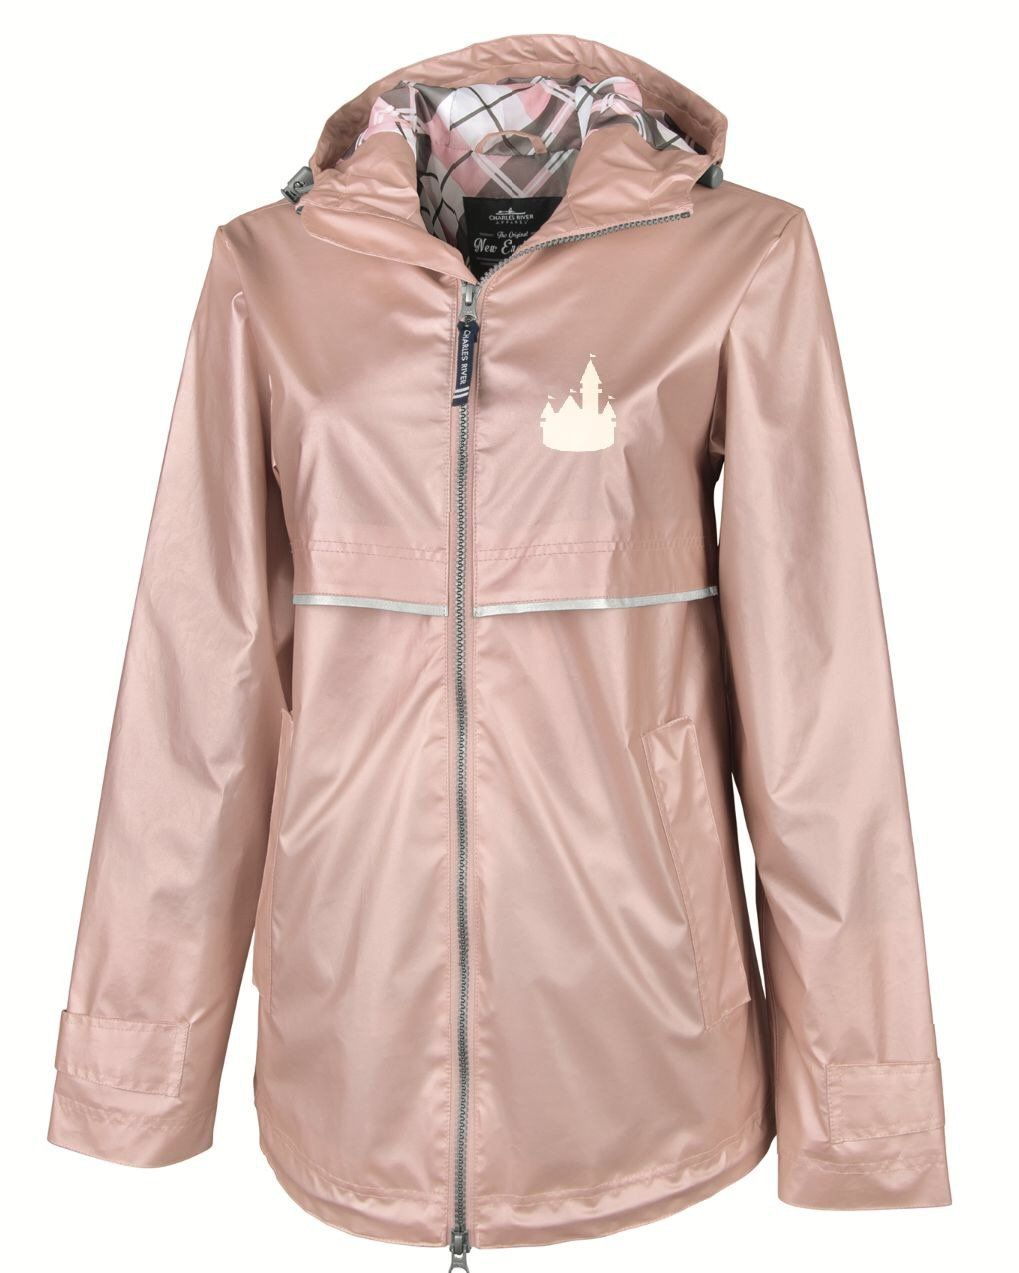 Rose Gold Castle Rain Jacket Limited Edition Monogrammed Rain Jacket Charles River Rain Jacket Rain Jacket